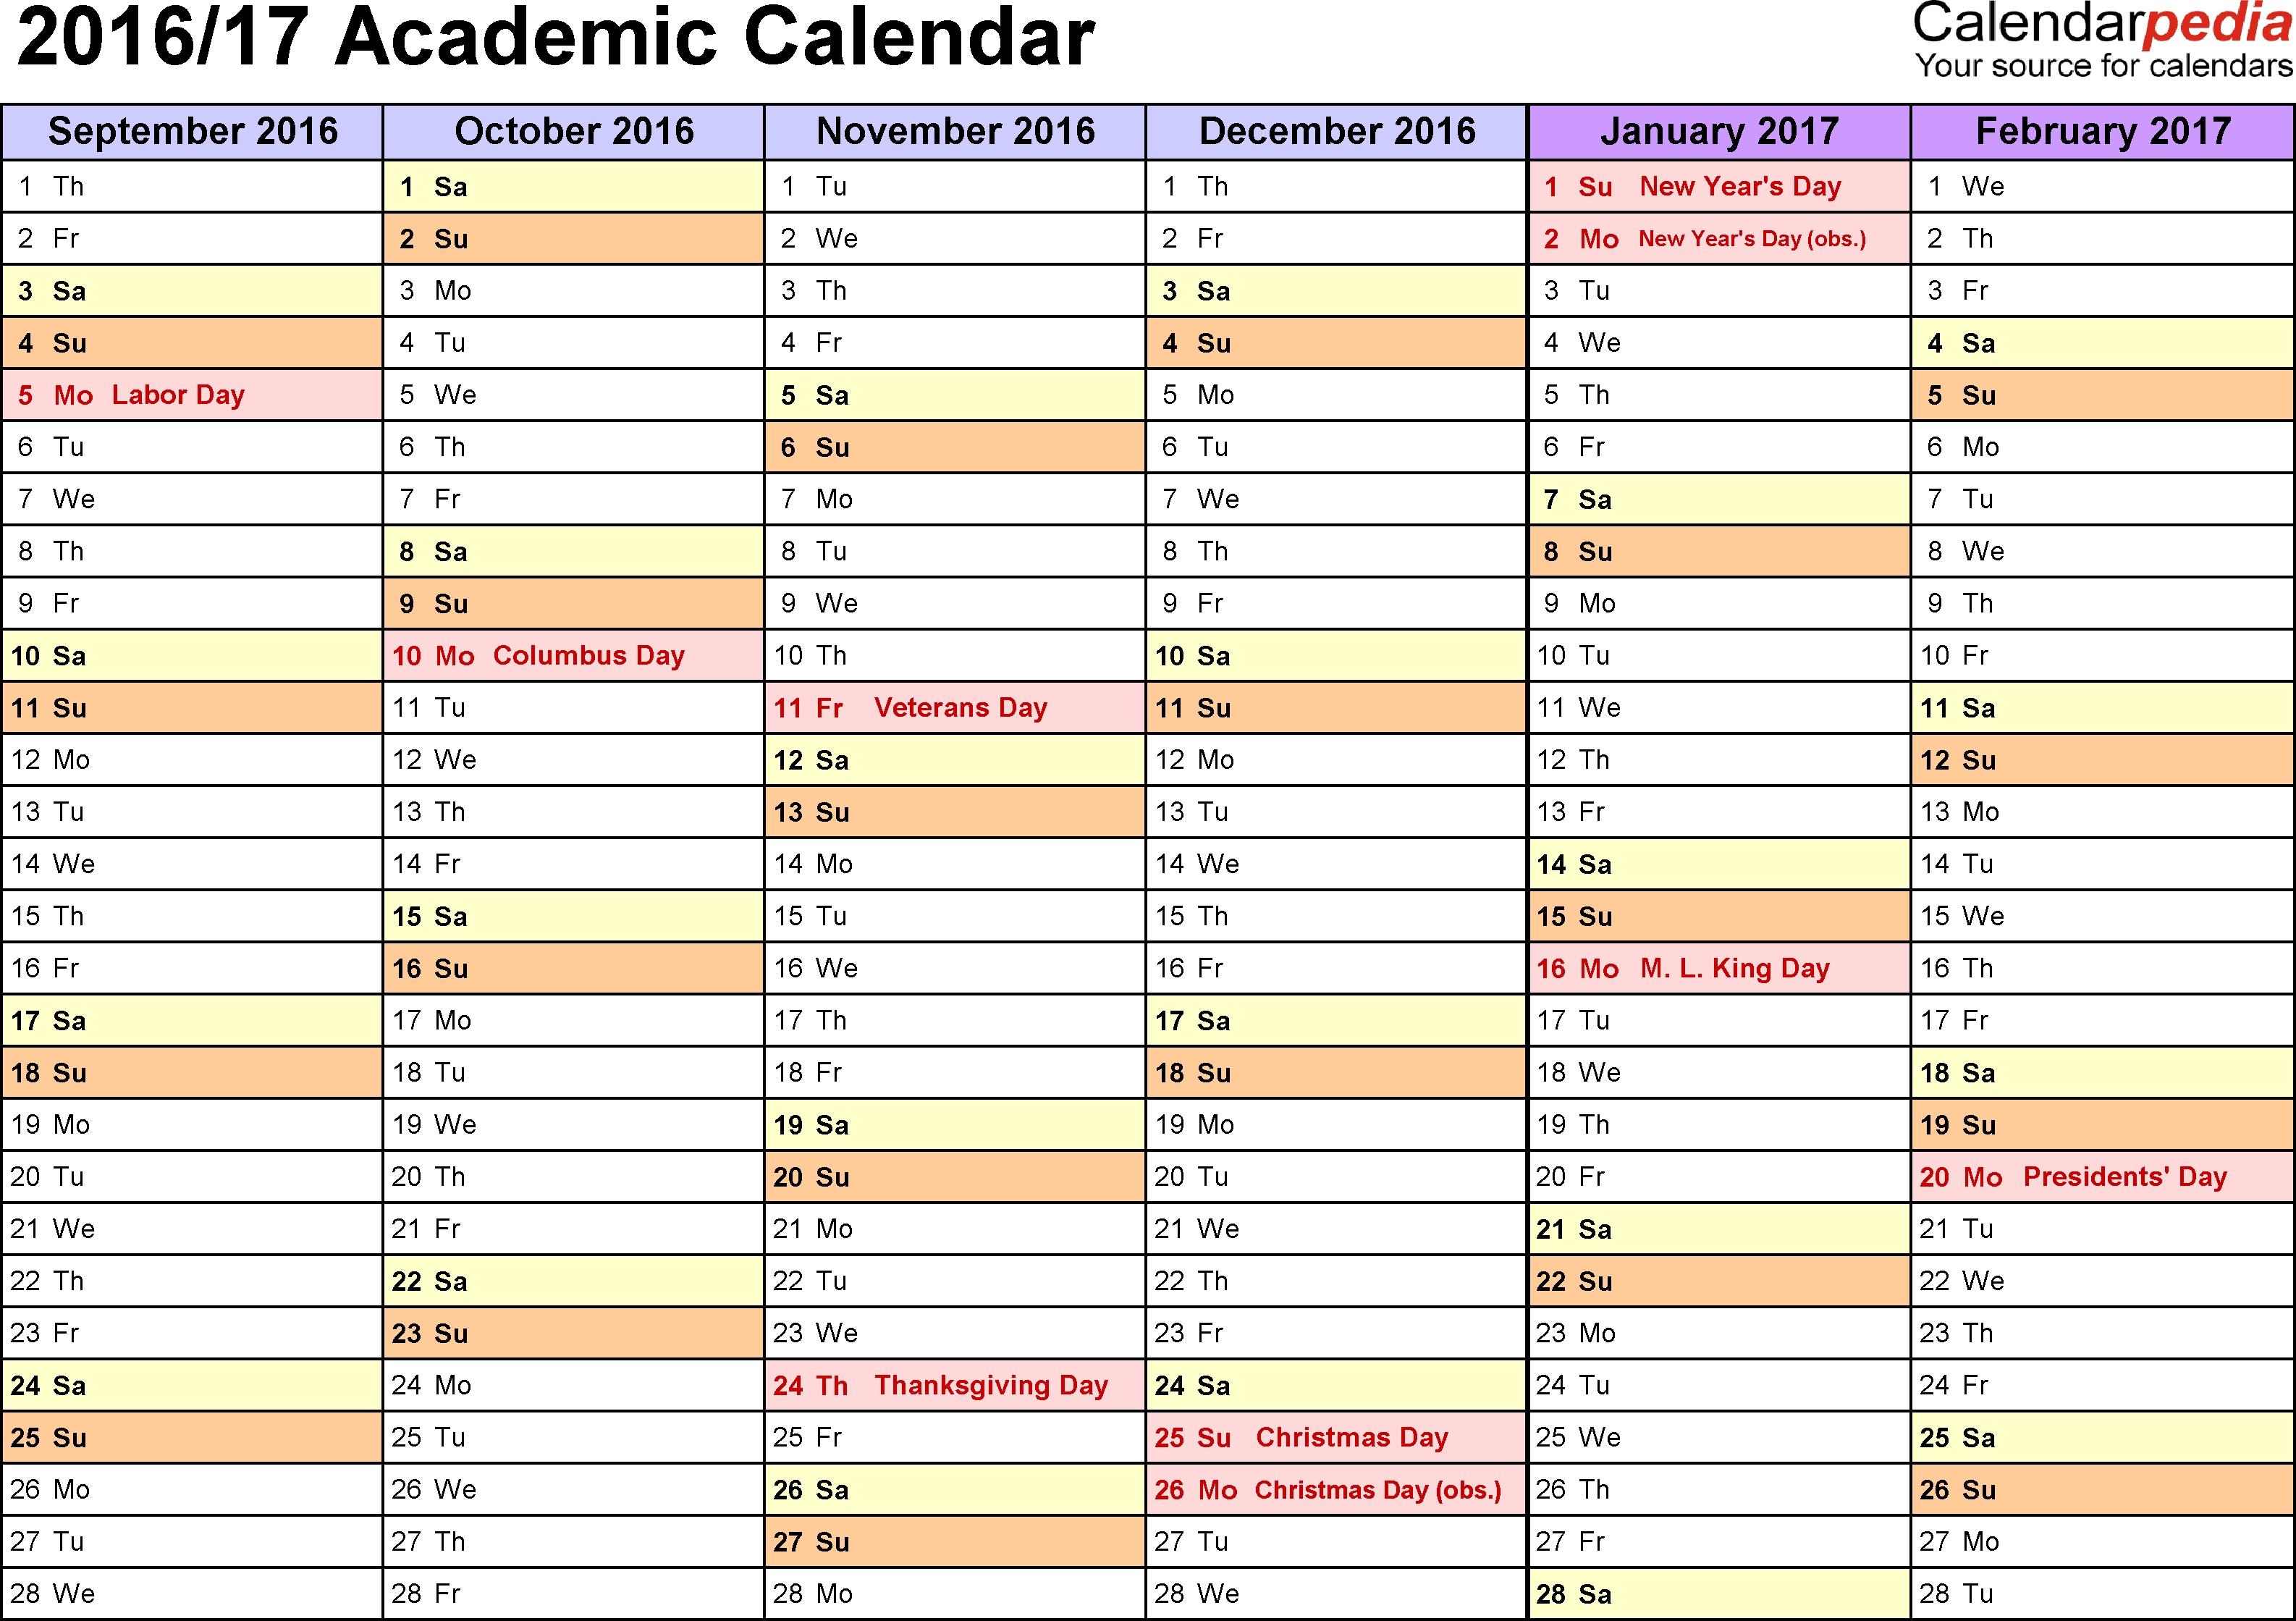 Academic Calendars 2016/2017 - Free Printable Word Templates pertaining to Template Academic Calendar With Notes